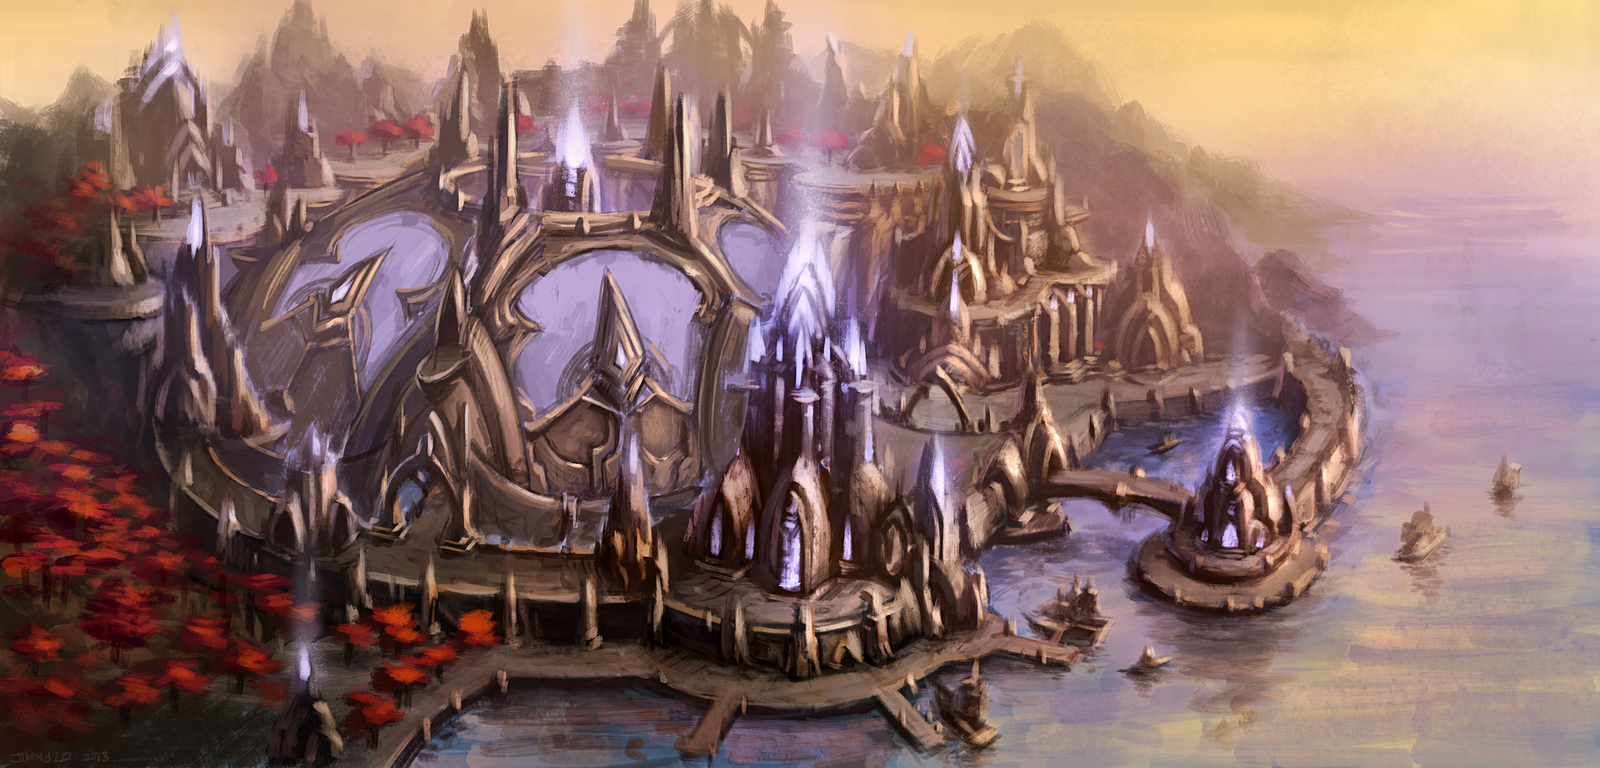 Shattrath (Warlords of Draenor)